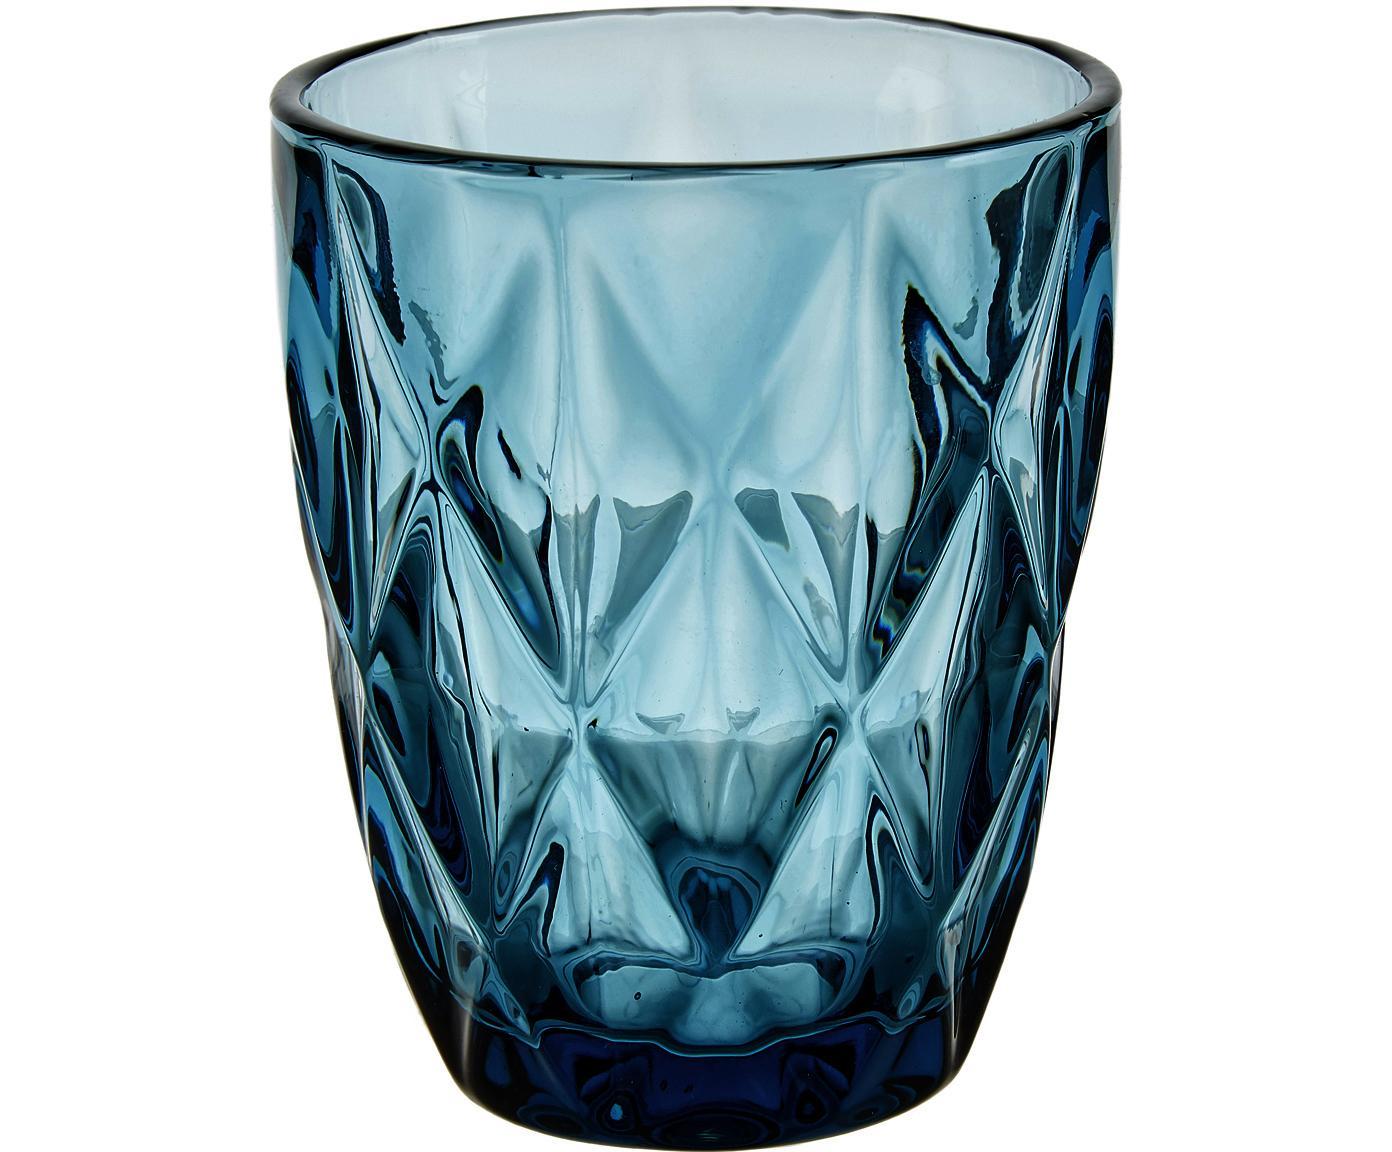 Wassergläser Colorado mit Strukturmuster, 4 Stück, Glas, Blau, Transparent, ∅ 8 x H 10 cm